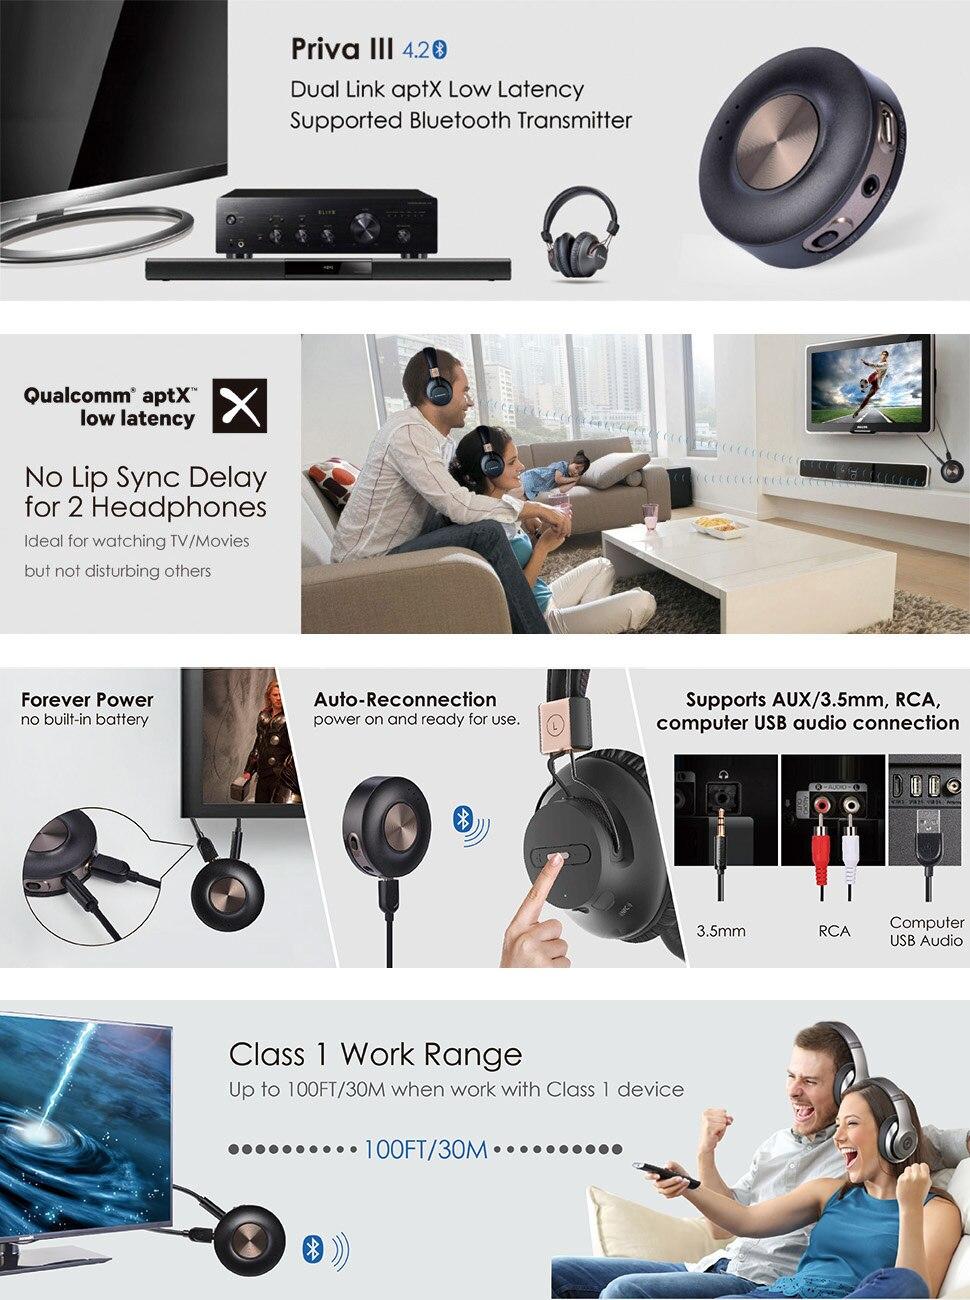 Avantree AptX LL Bluetooth 4 2 Transmitter for TV PC (3 5mm, RCA, Computer  USB digital audio) Dual Link Wireless Audio Adapter